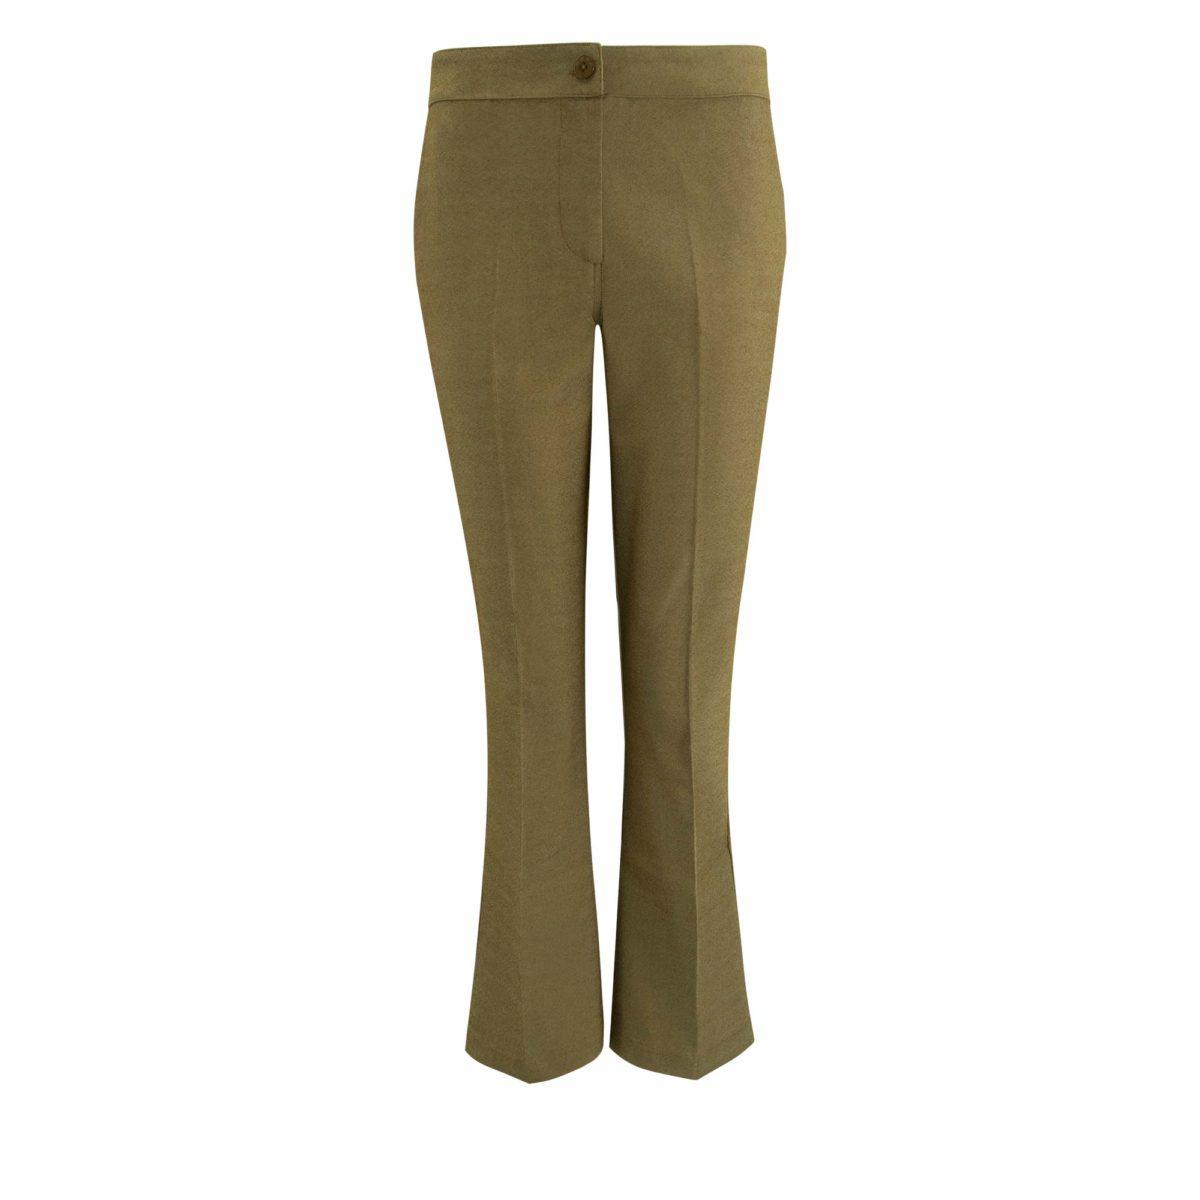 Pantalone Flare bull denim Verde - vista frontale   Nicla